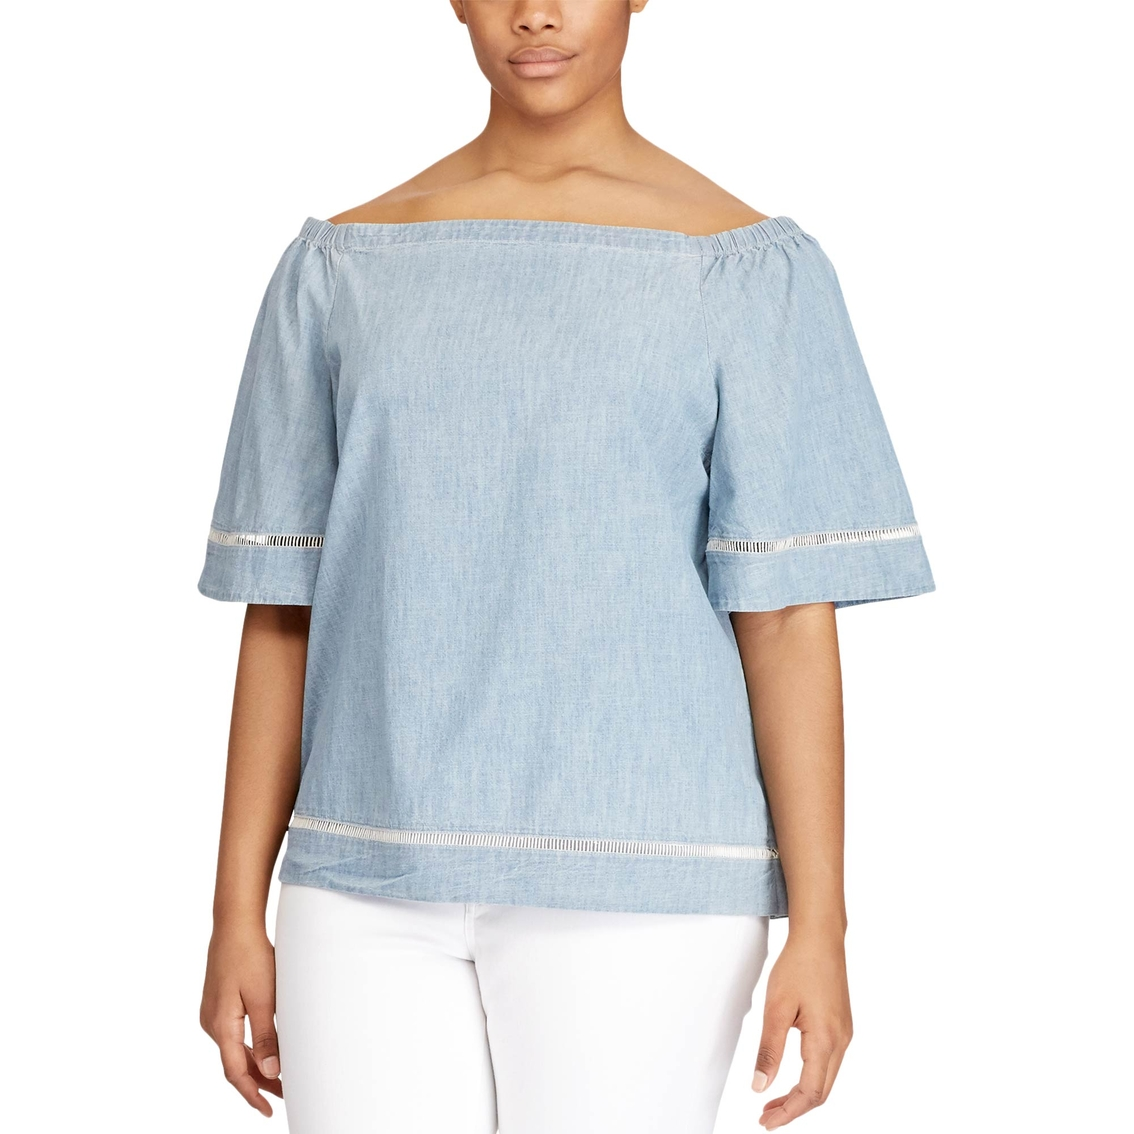 2cadaffd648d5 Lauren Ralph Lauren Plus Size Karleigh Chambray Off The Shoulder Top ...